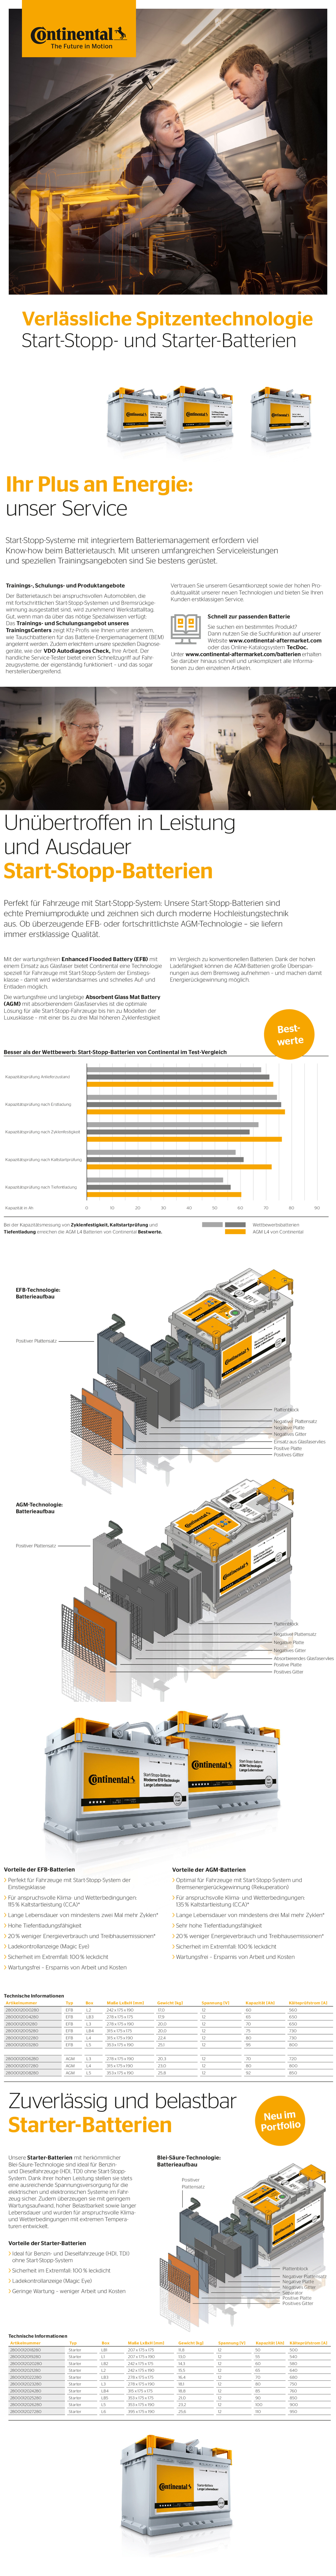 Autobatterie Continental AGM 12V 70Ah 720A Start-Stop = Varta 570901076 71 74 Ah